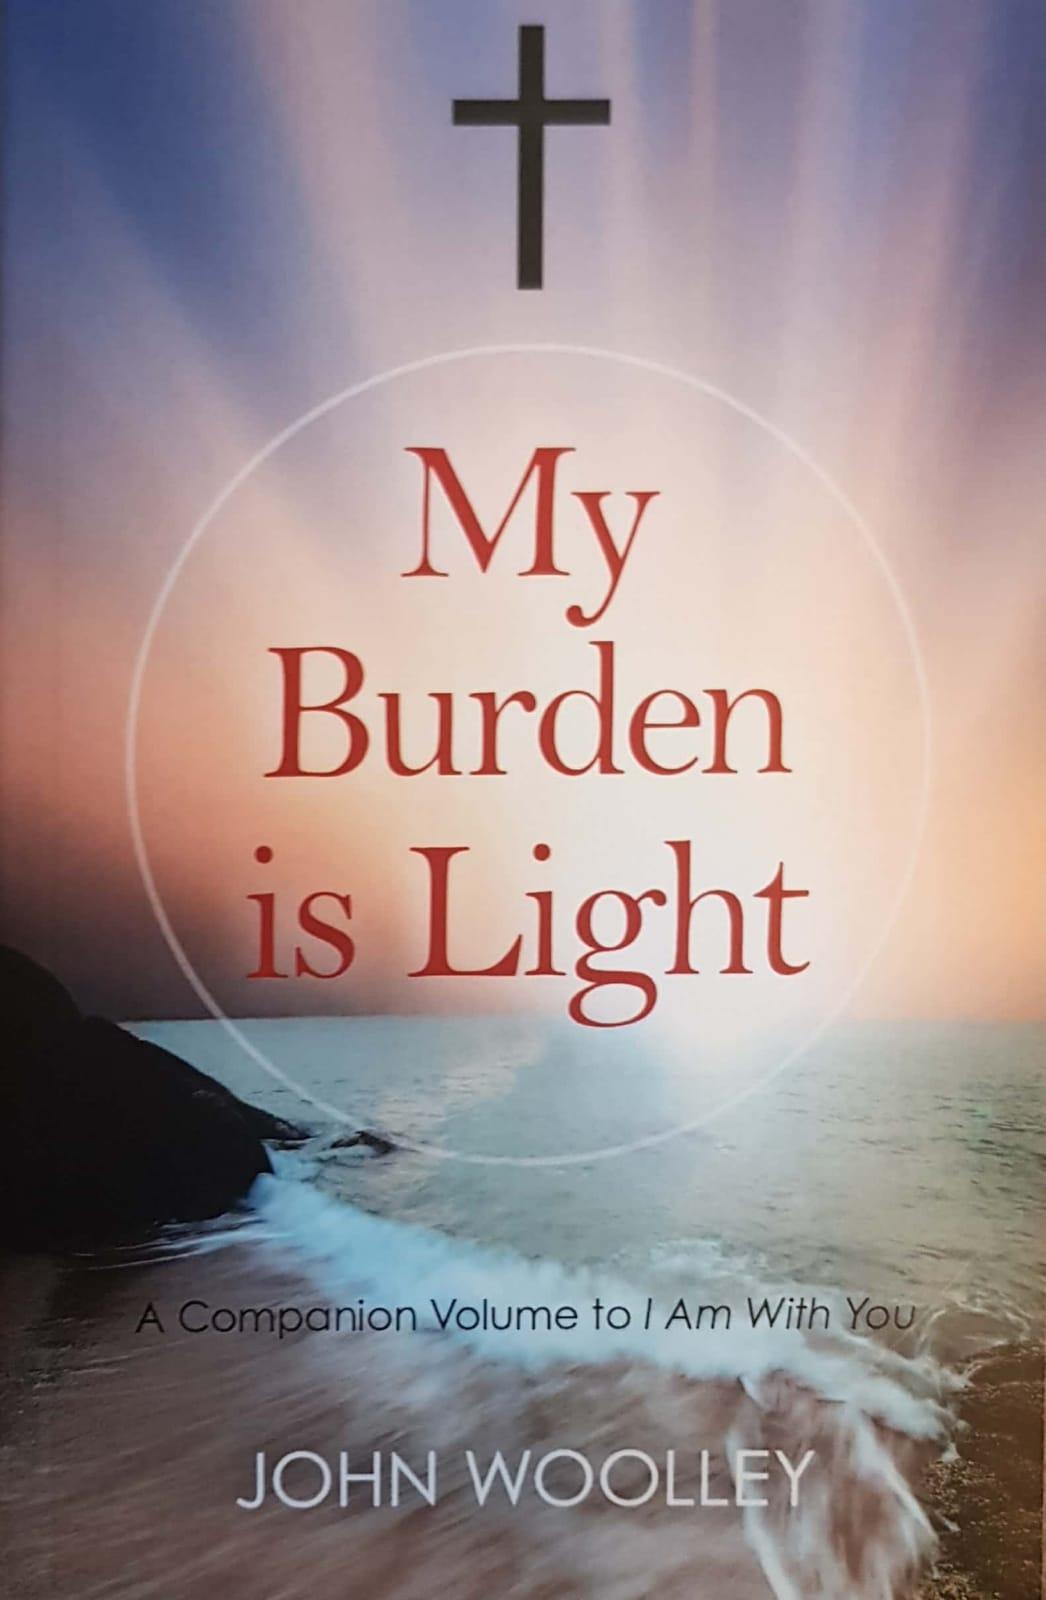 My Burden Is Light - Full Paperback Edition